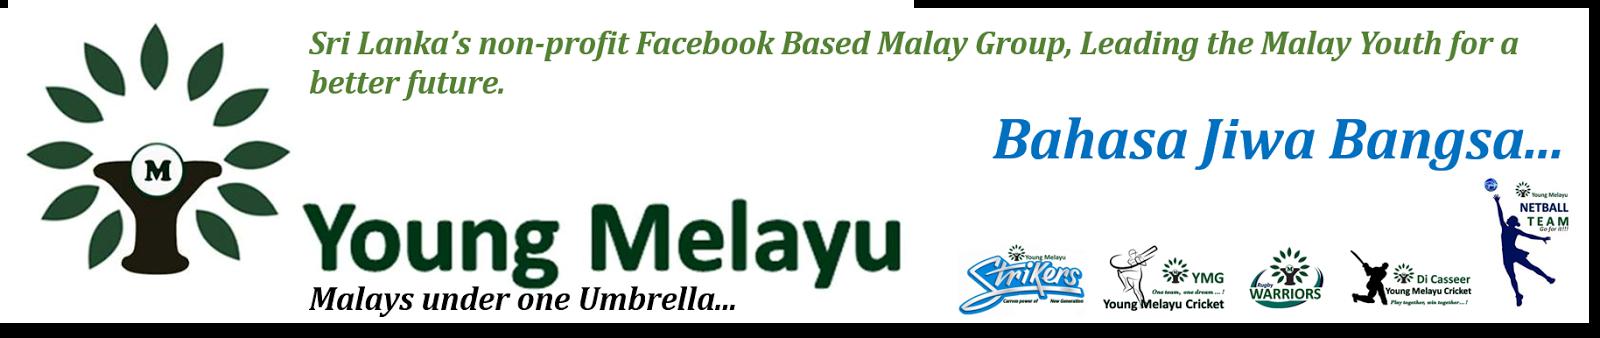 YoungMelayu Sri Lanka